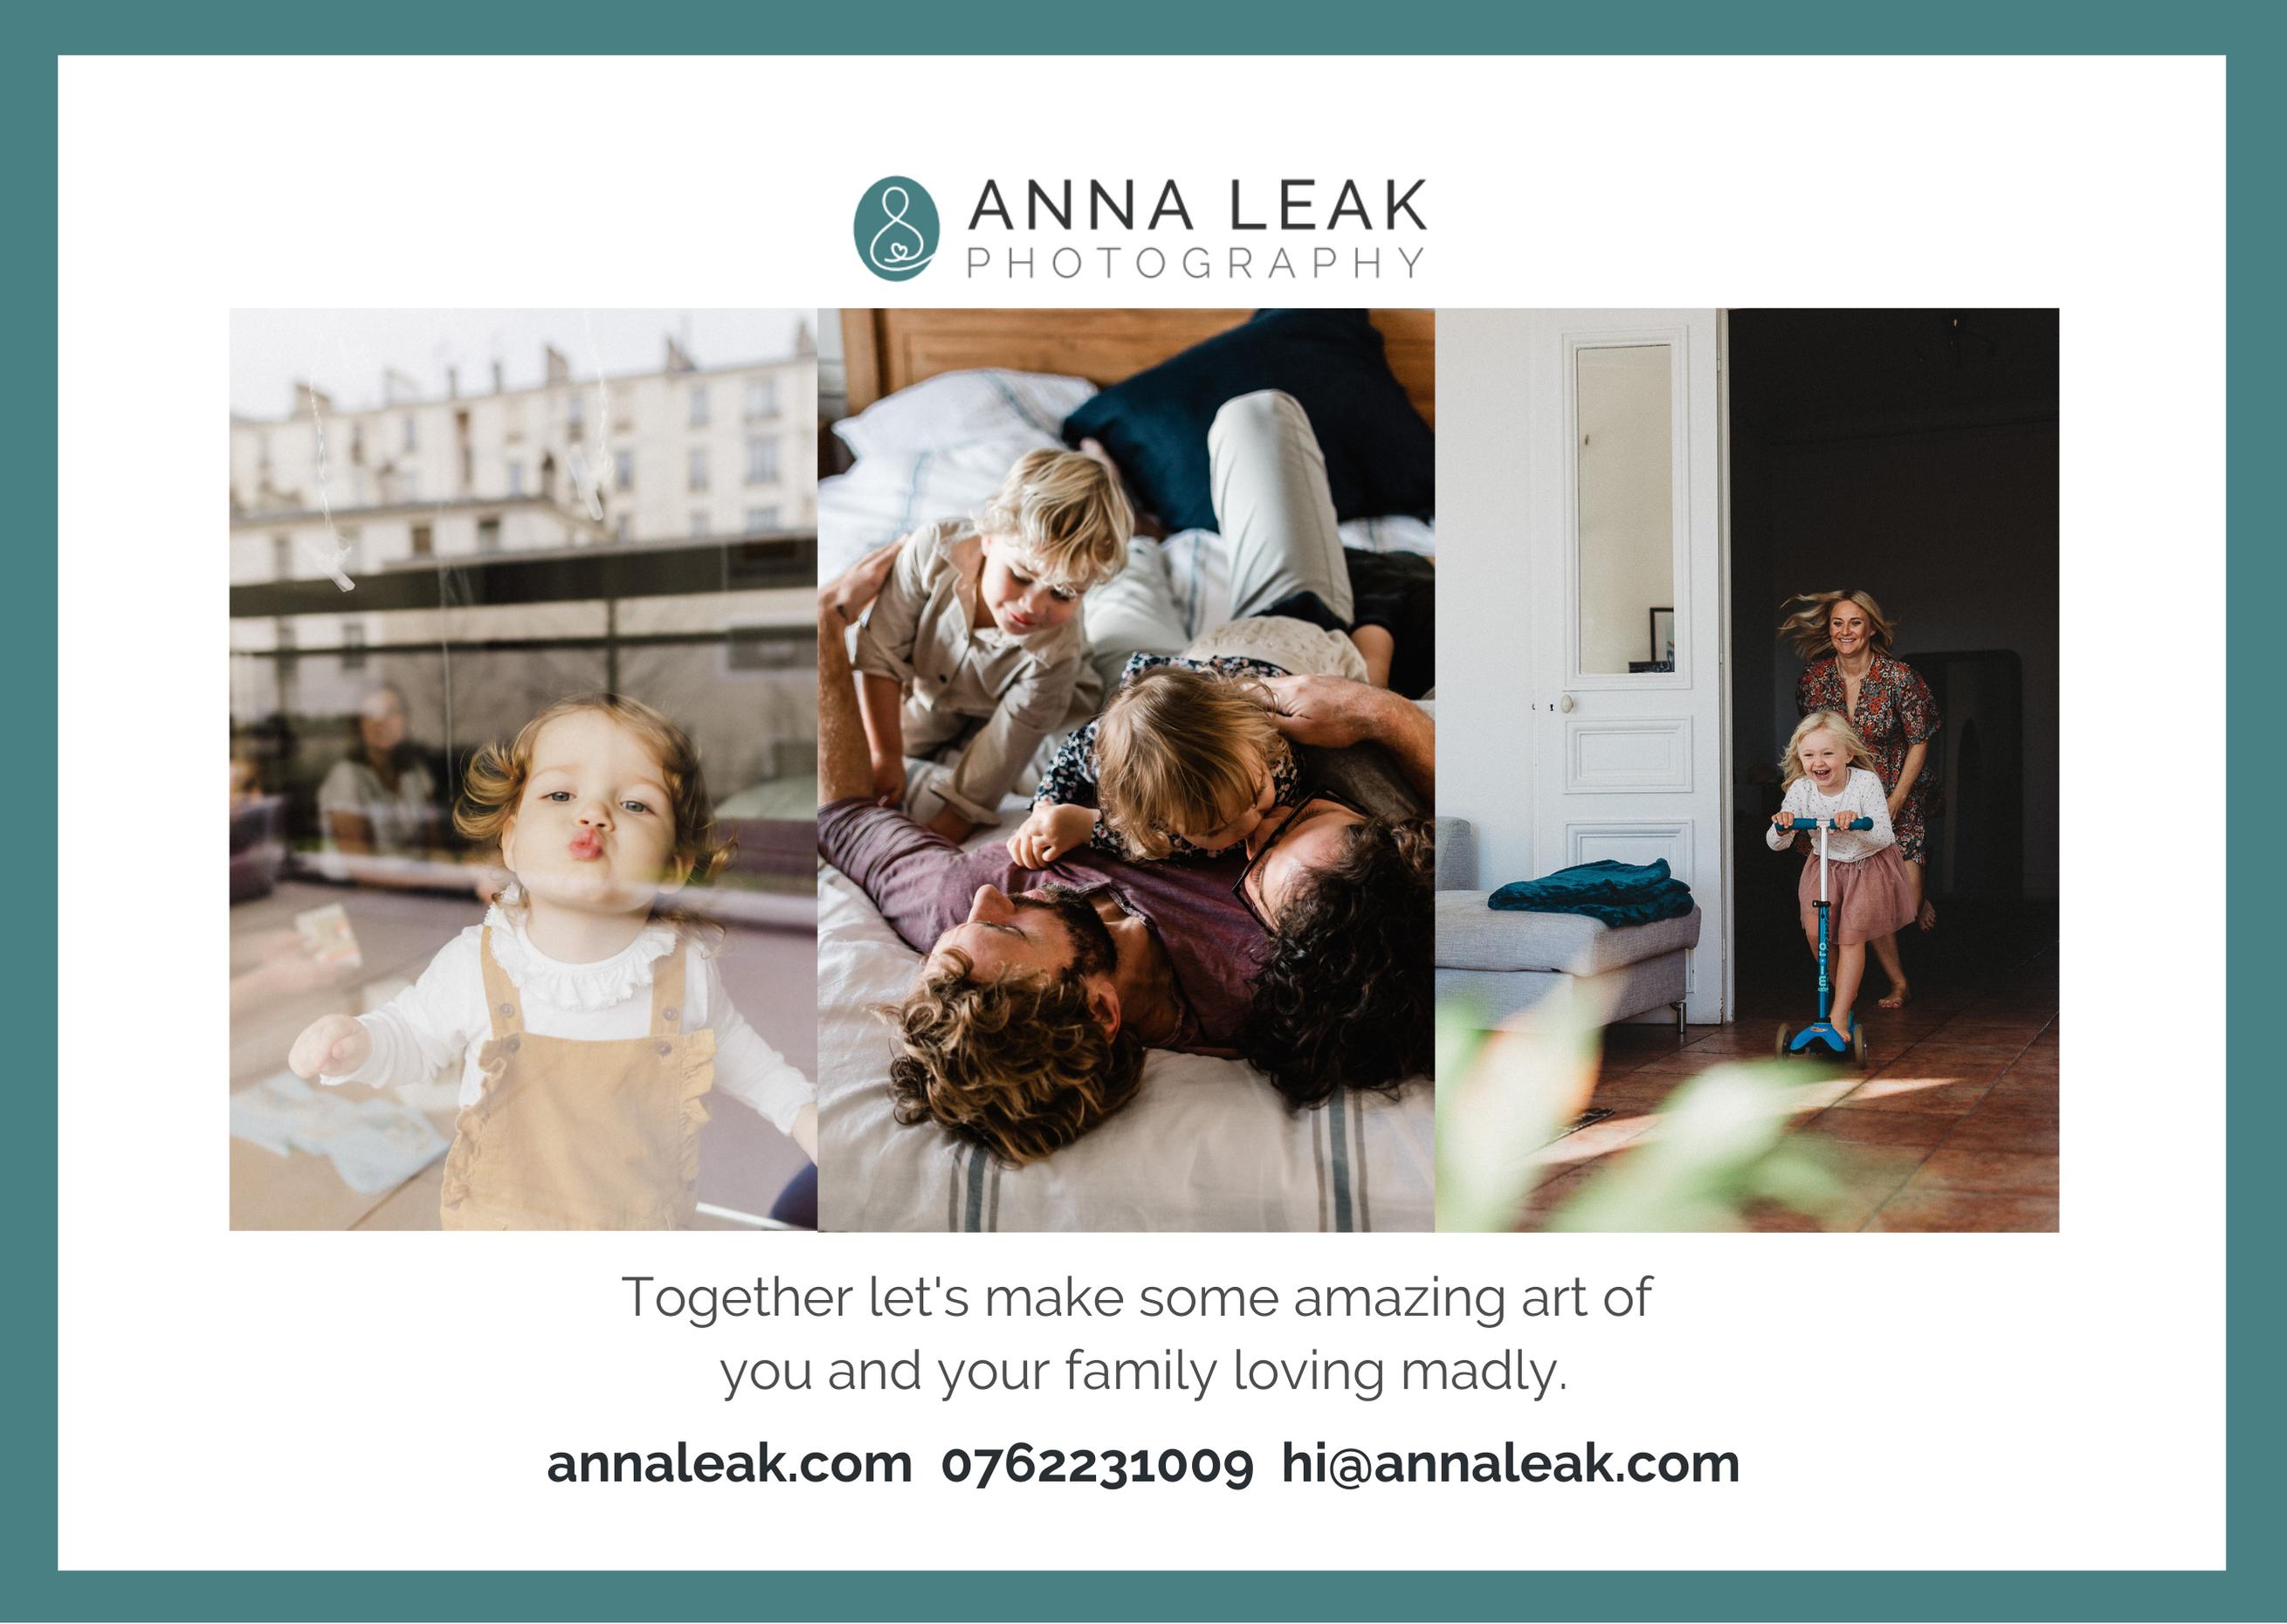 Anna Leak Photography